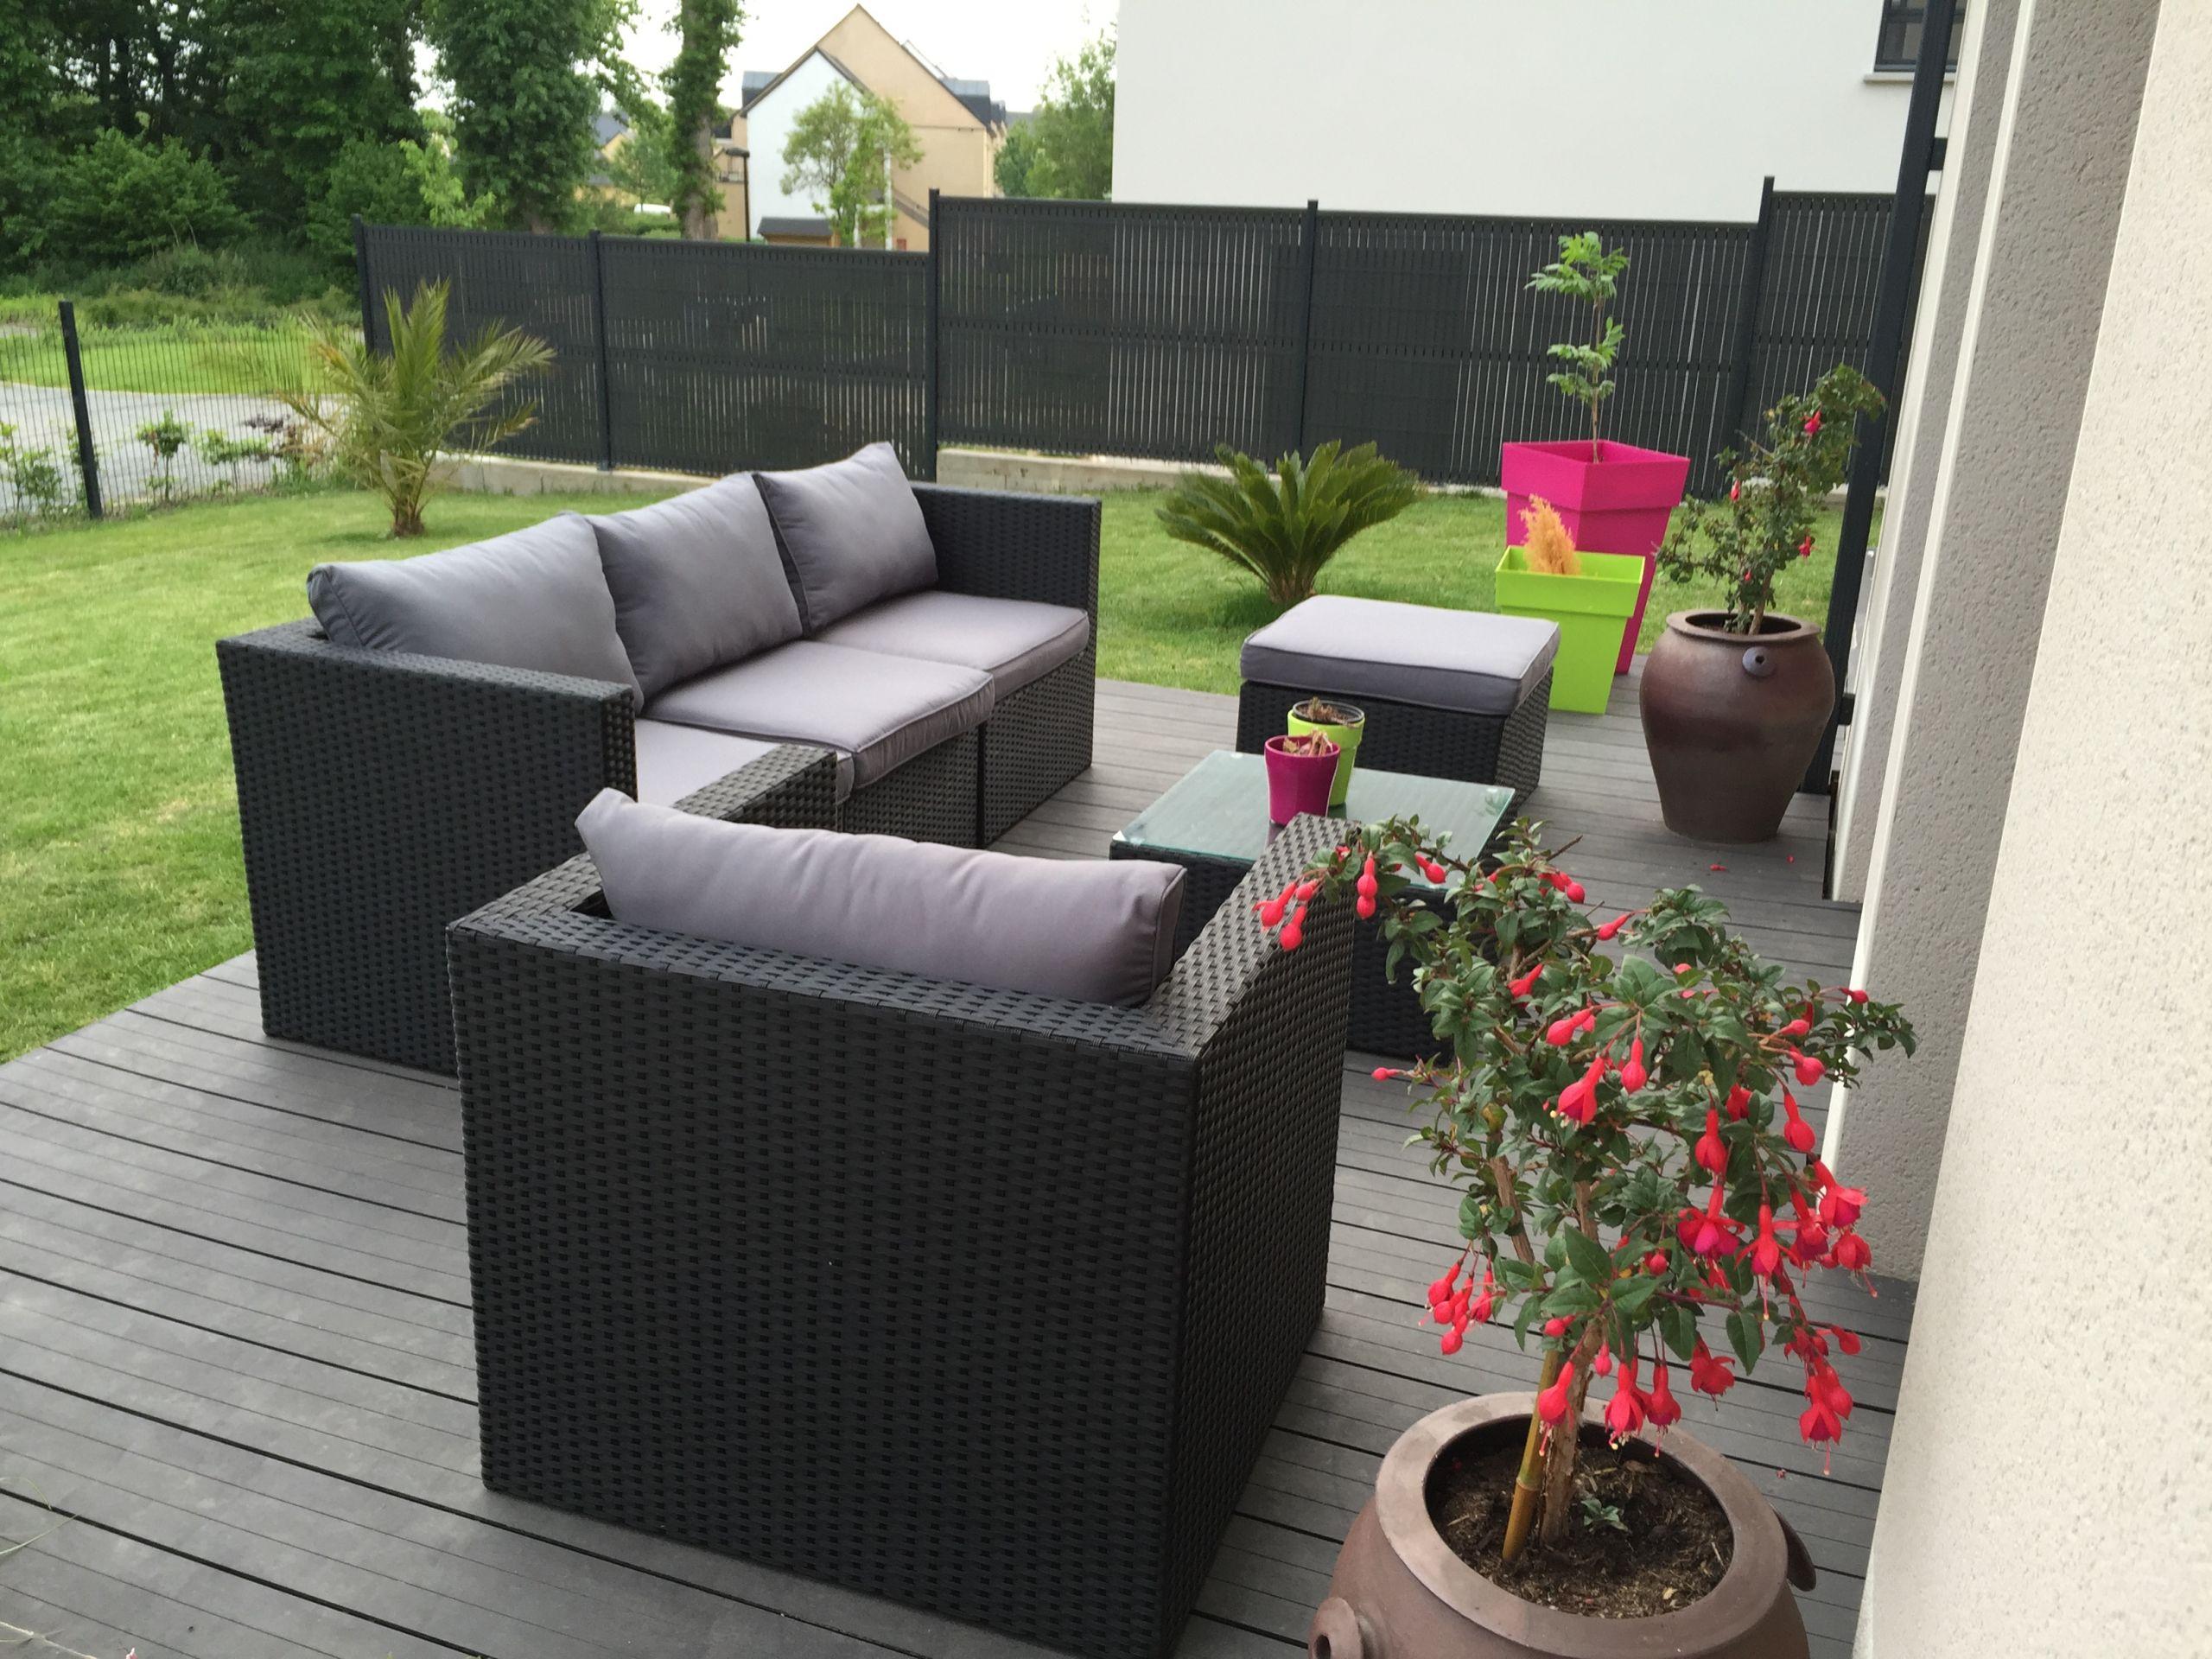 Table De Jardin Resine Luxe Dalle Terrasse Ikea   Salon Jardin avec Mobilier De Jardin Ikea